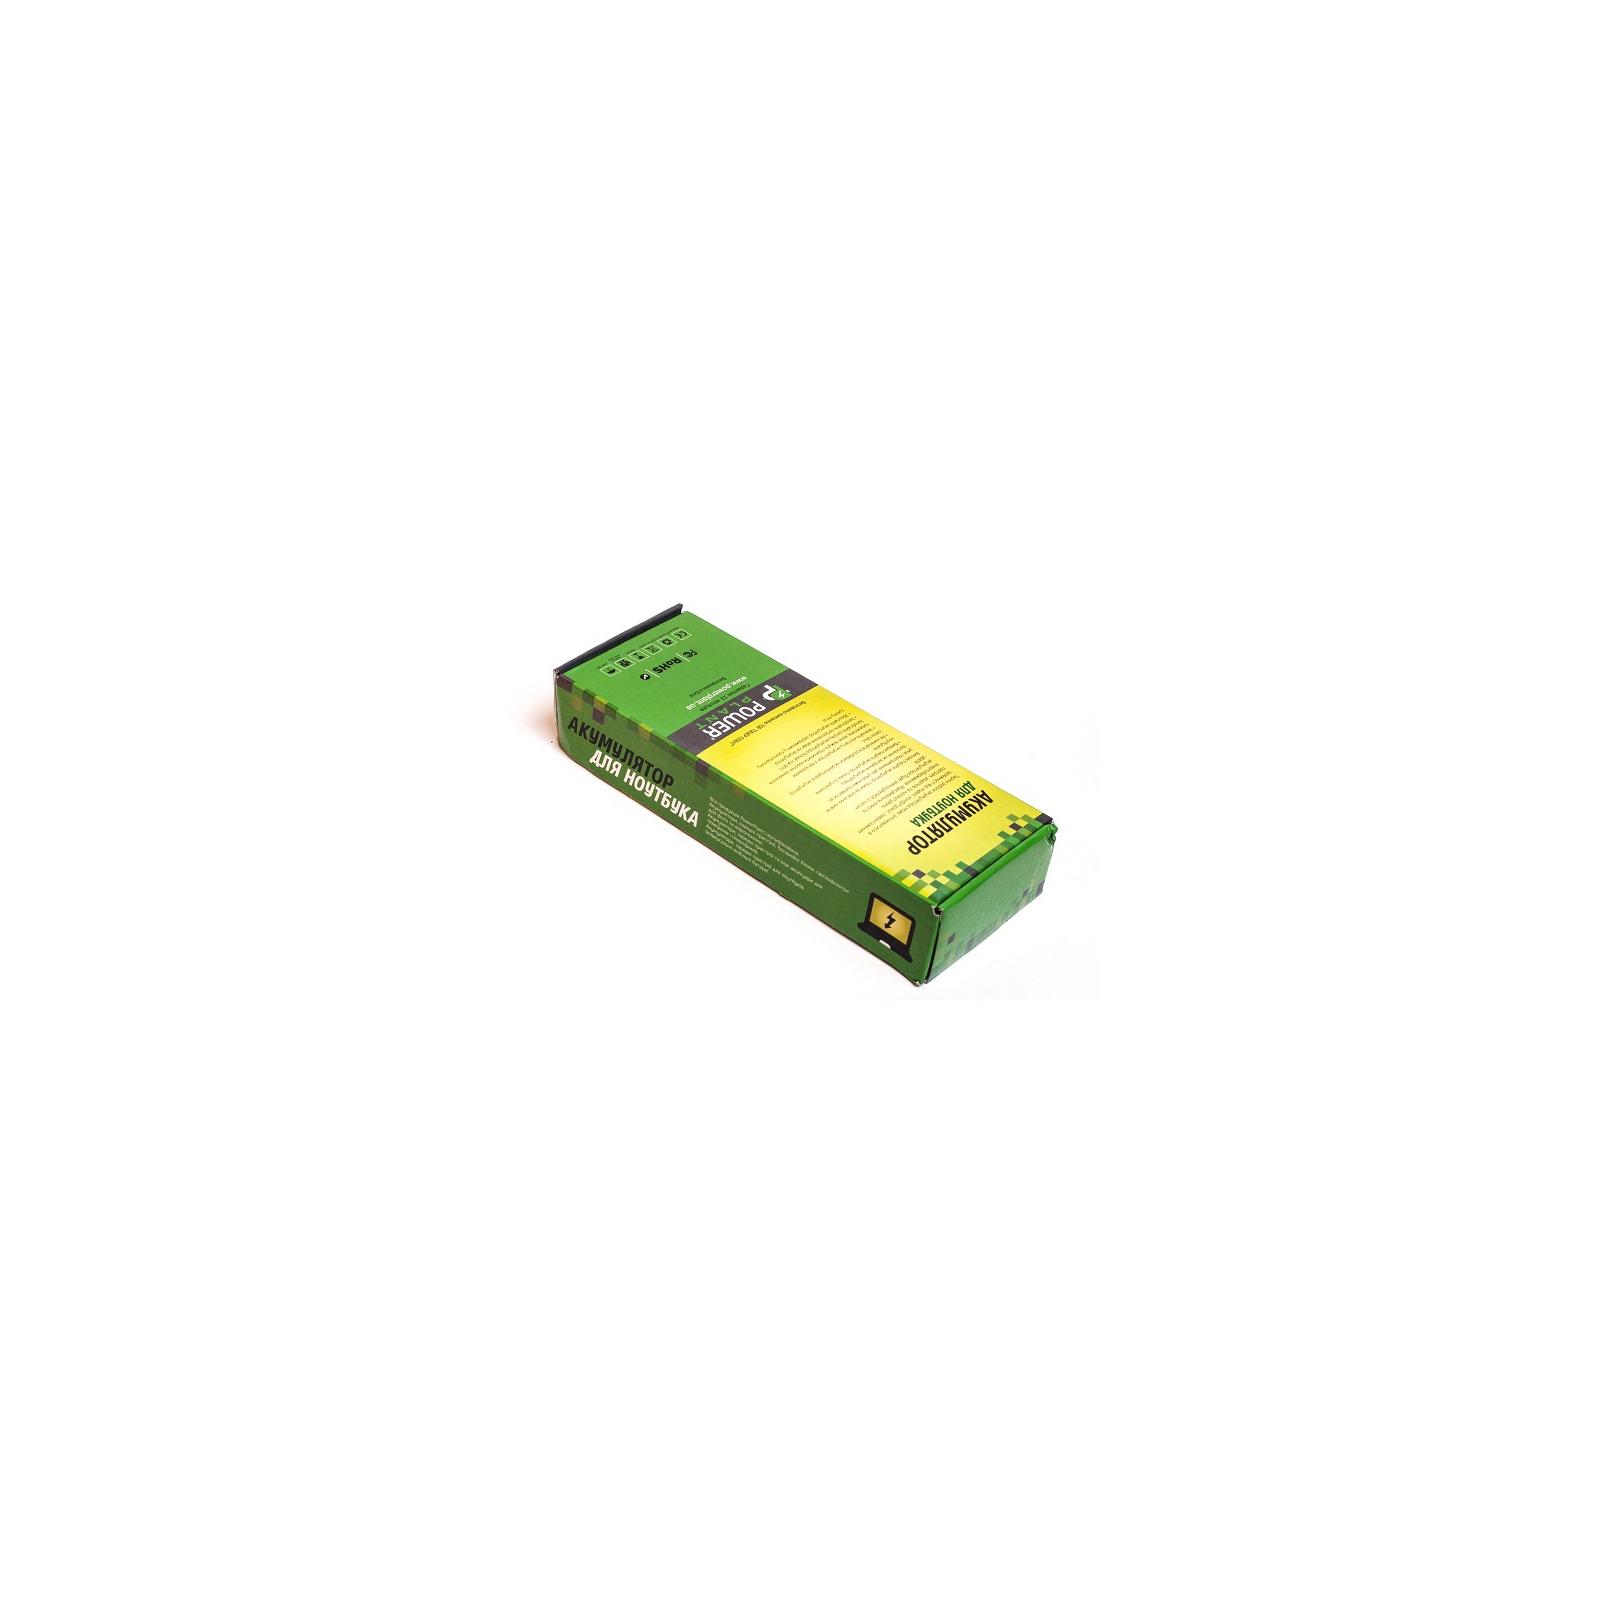 Аккумулятор для ноутбука HP EliteBook 8530 (HSTNN-LB60, H8530) 14.4V 5200mAh PowerPlant (NB00000127) изображение 2